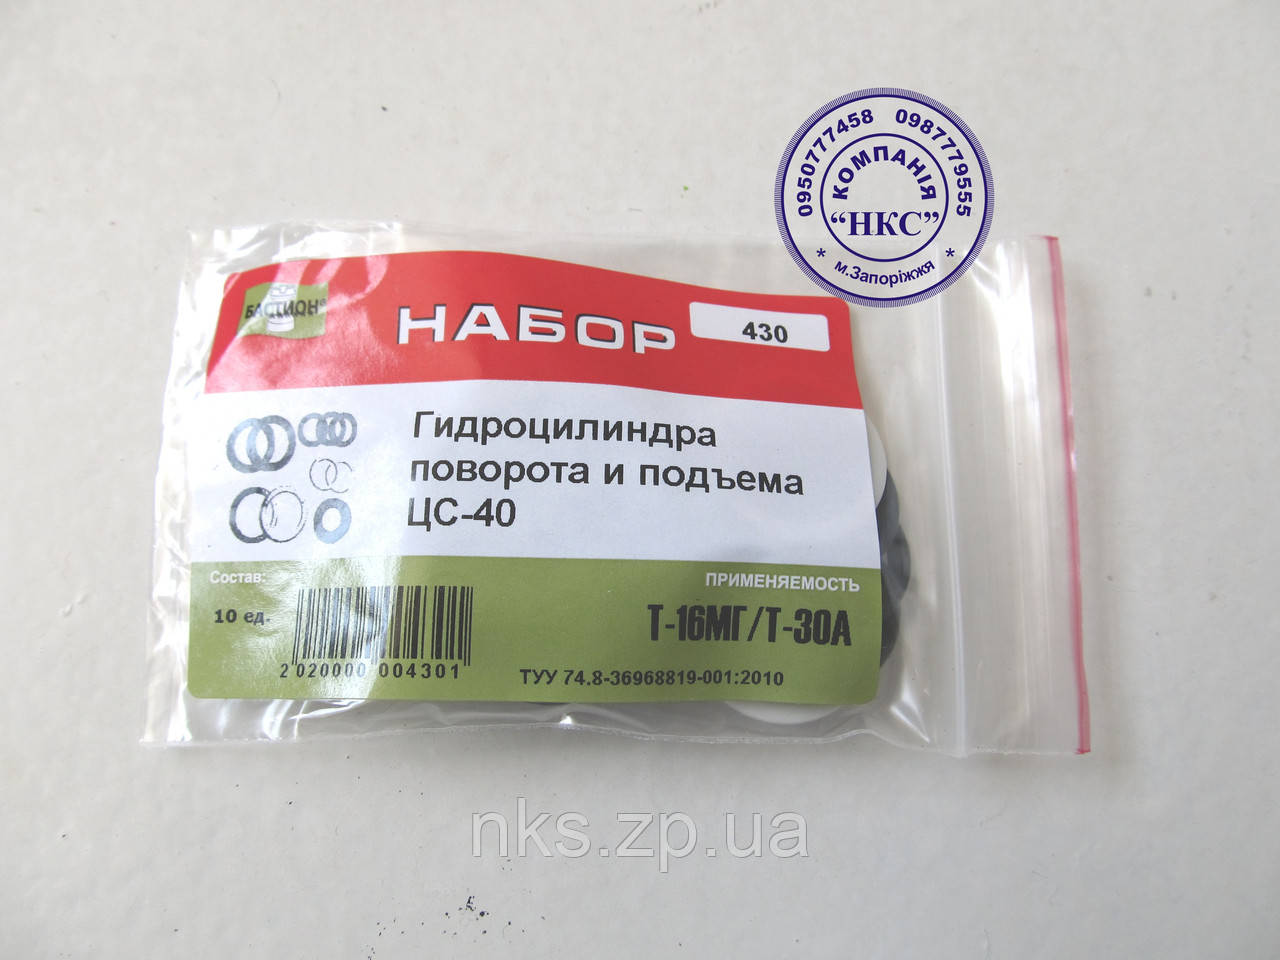 Ремкомплект гидроцилиндра ЦС-40 Т-16